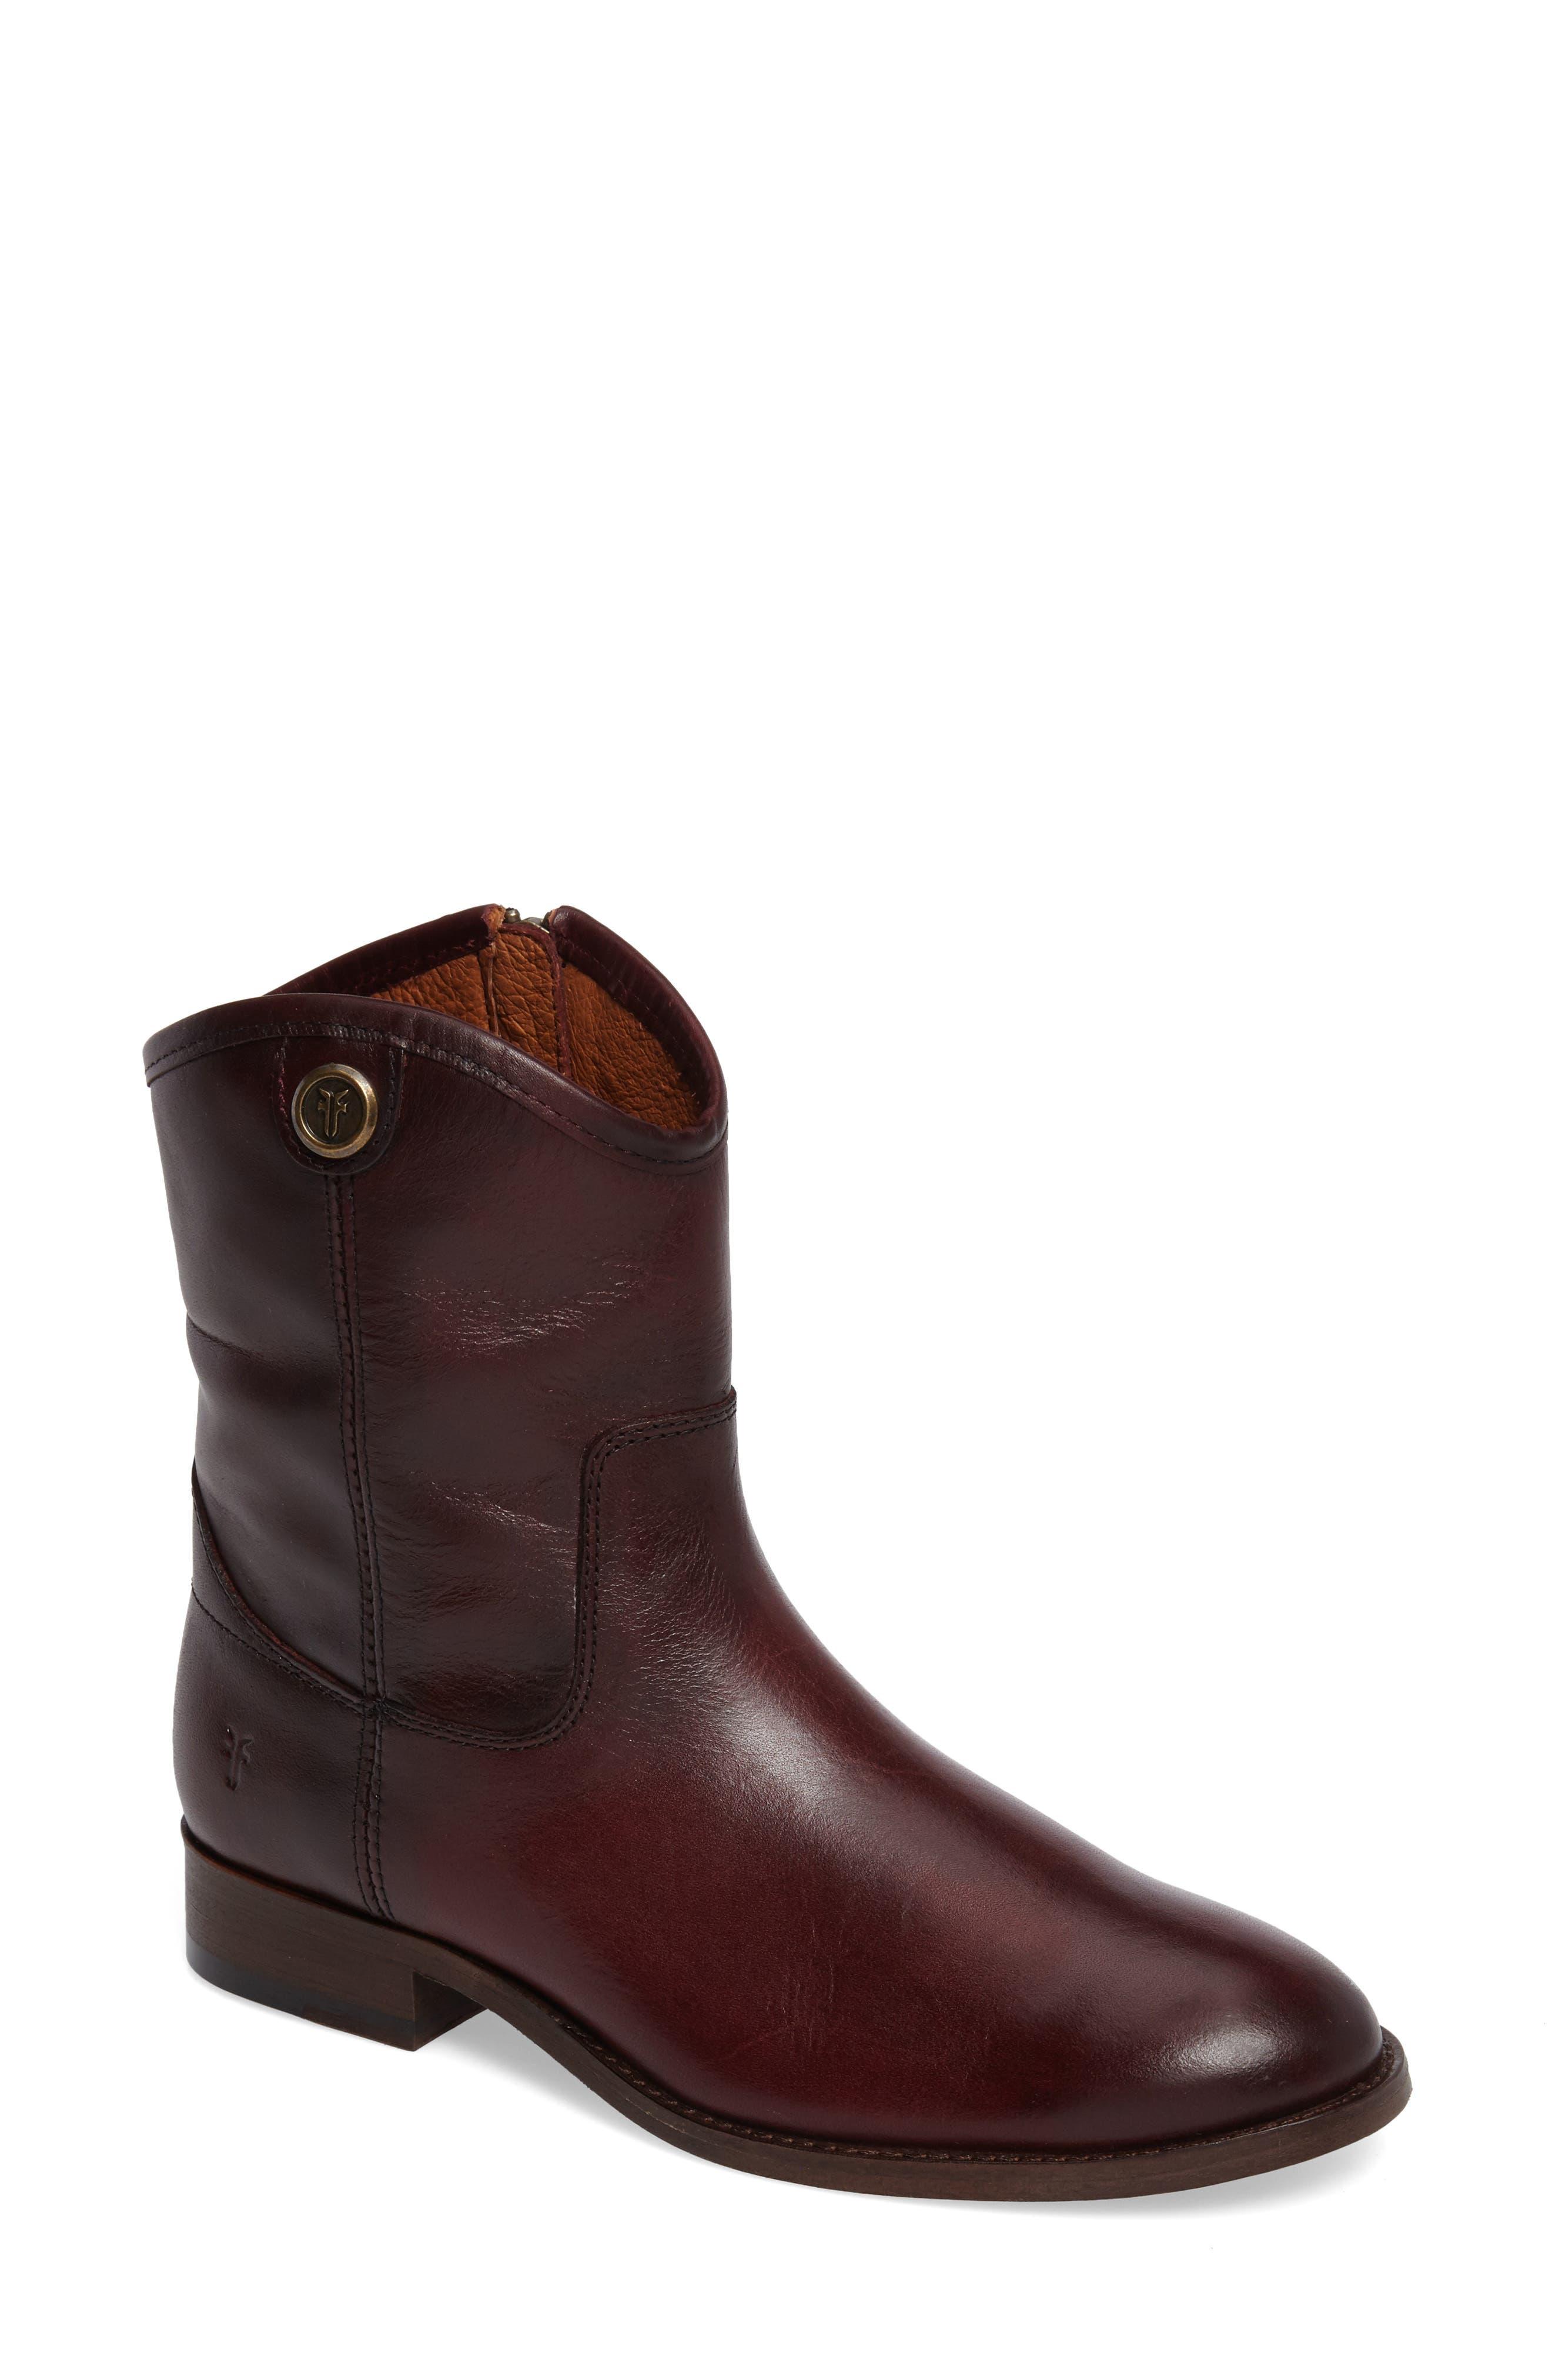 Melissa Short 2 Boot,                         Main,                         color, 938